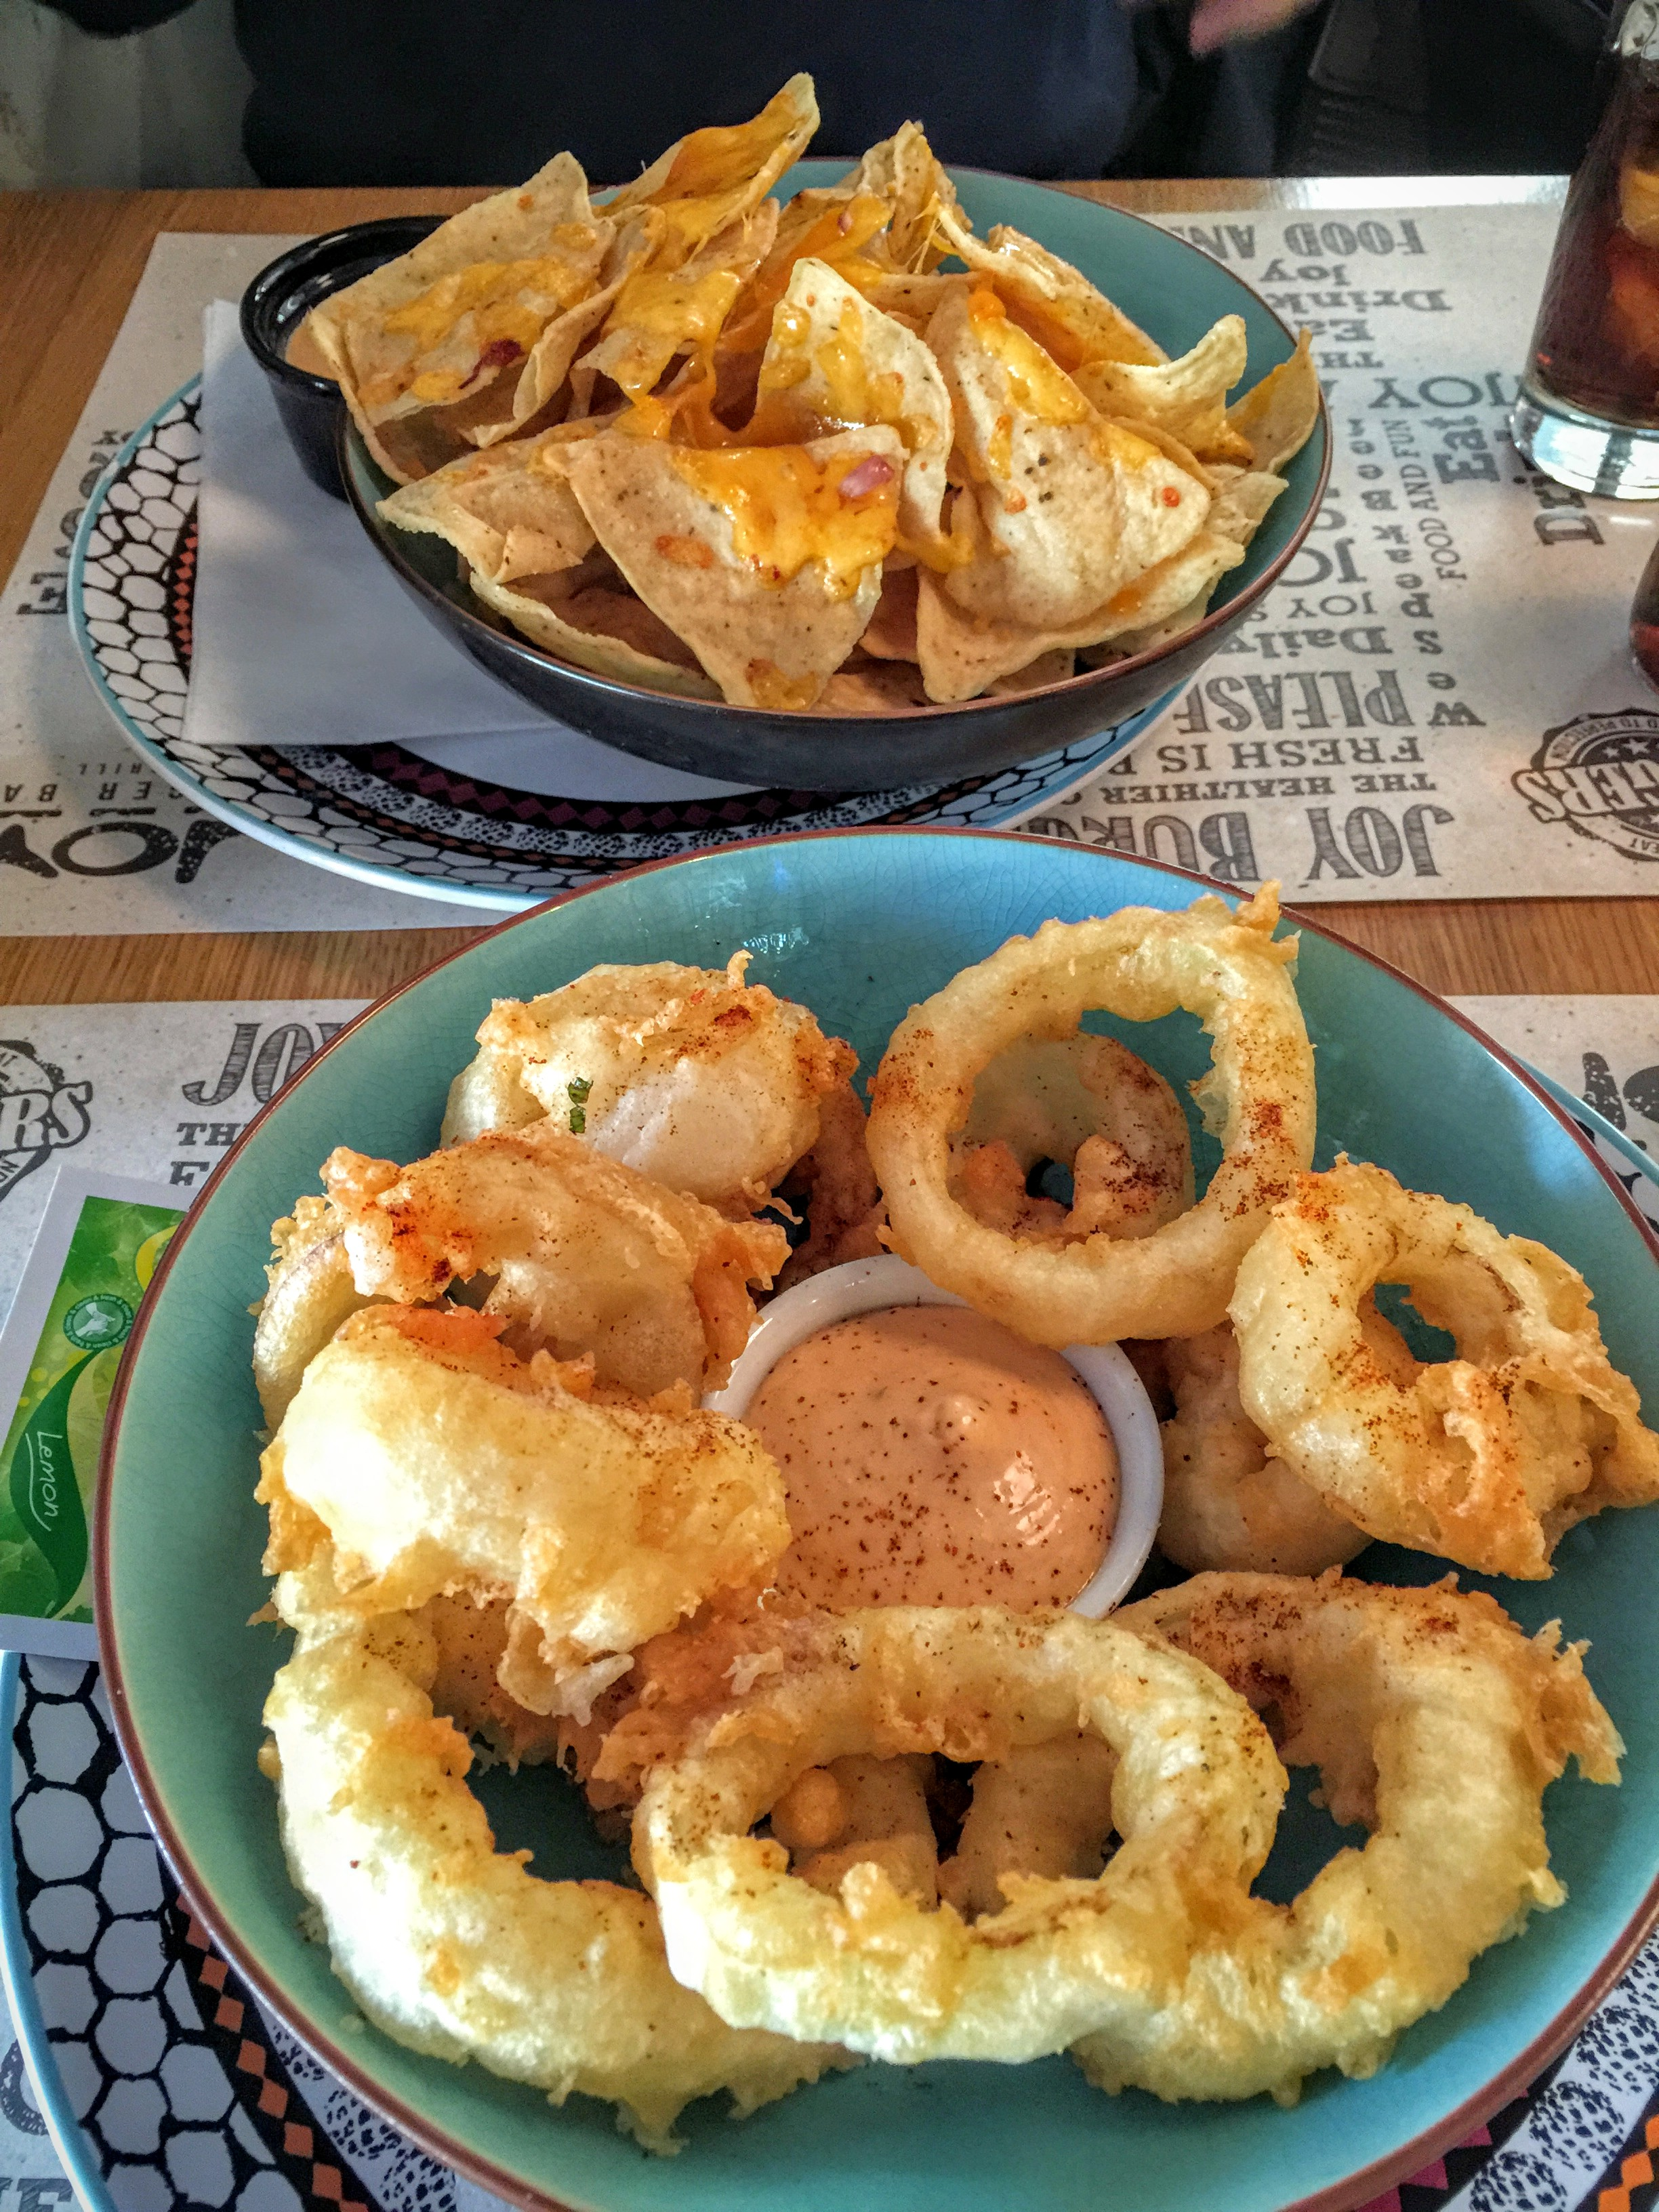 Joy Burger bar & grill appetizers.jpg